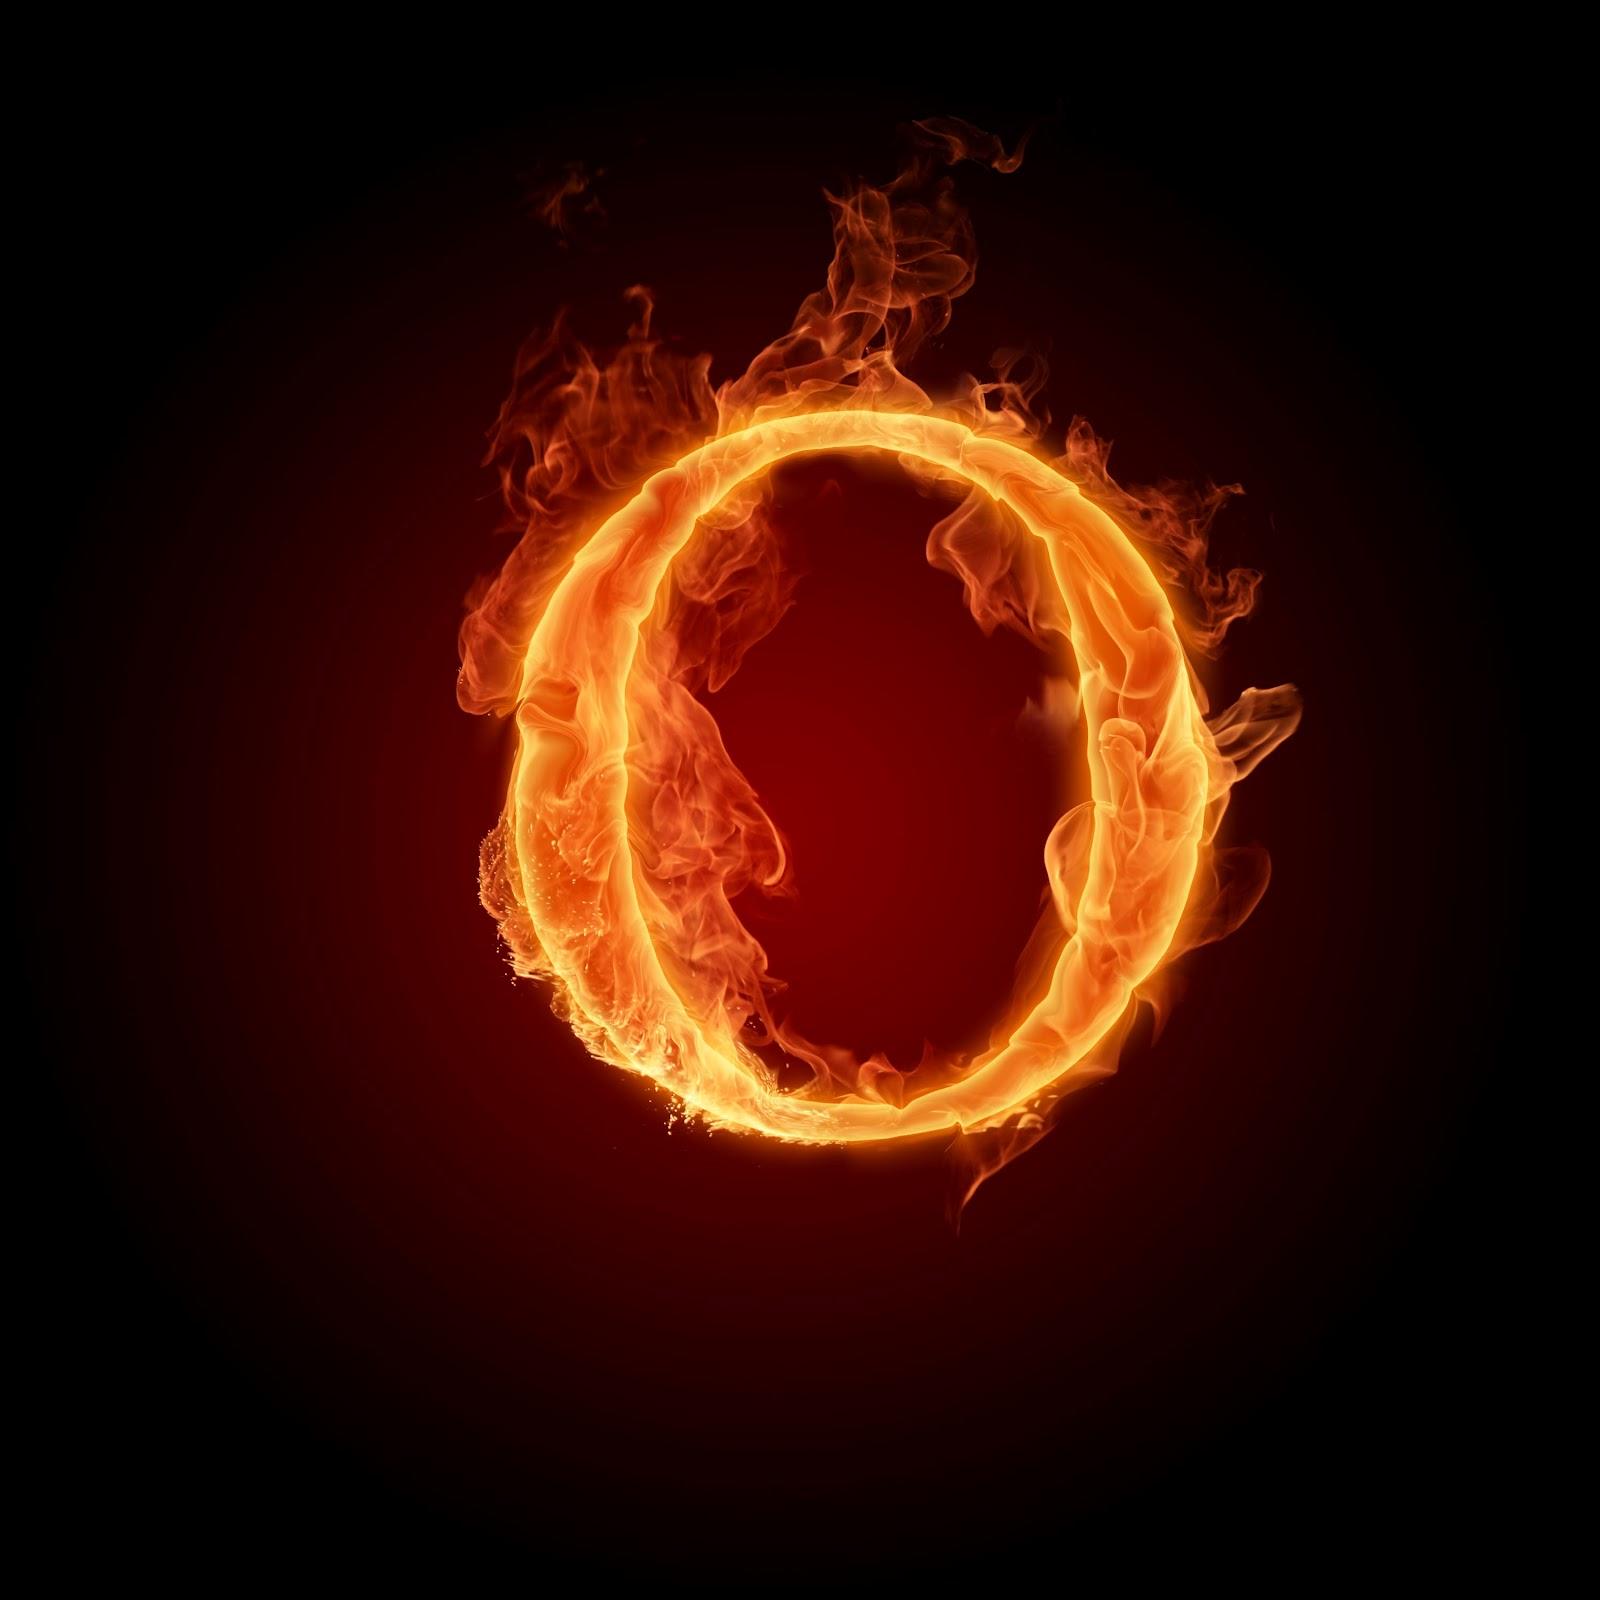 http://3.bp.blogspot.com/-FqG5D23QnJQ/UB0y7_2yNEI/AAAAAAAAAKk/T5hT3bp1LhU/s1600/Burning%2BAlphabet%2BWallpaper%2BO.jpg